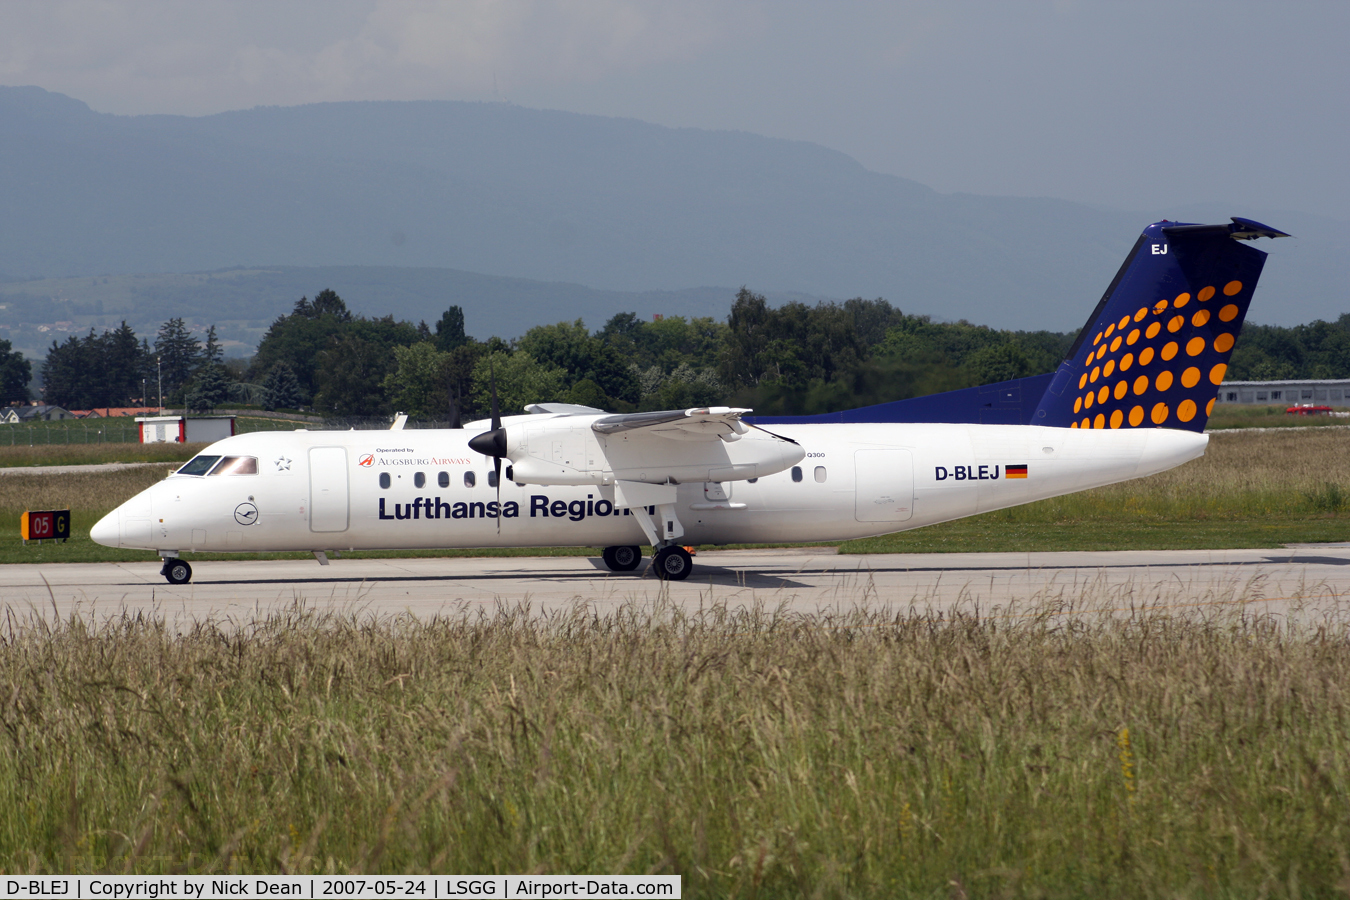 D-BLEJ, 1998 De Havilland Canada DHC-8-314 Dash 8 C/N 521, /